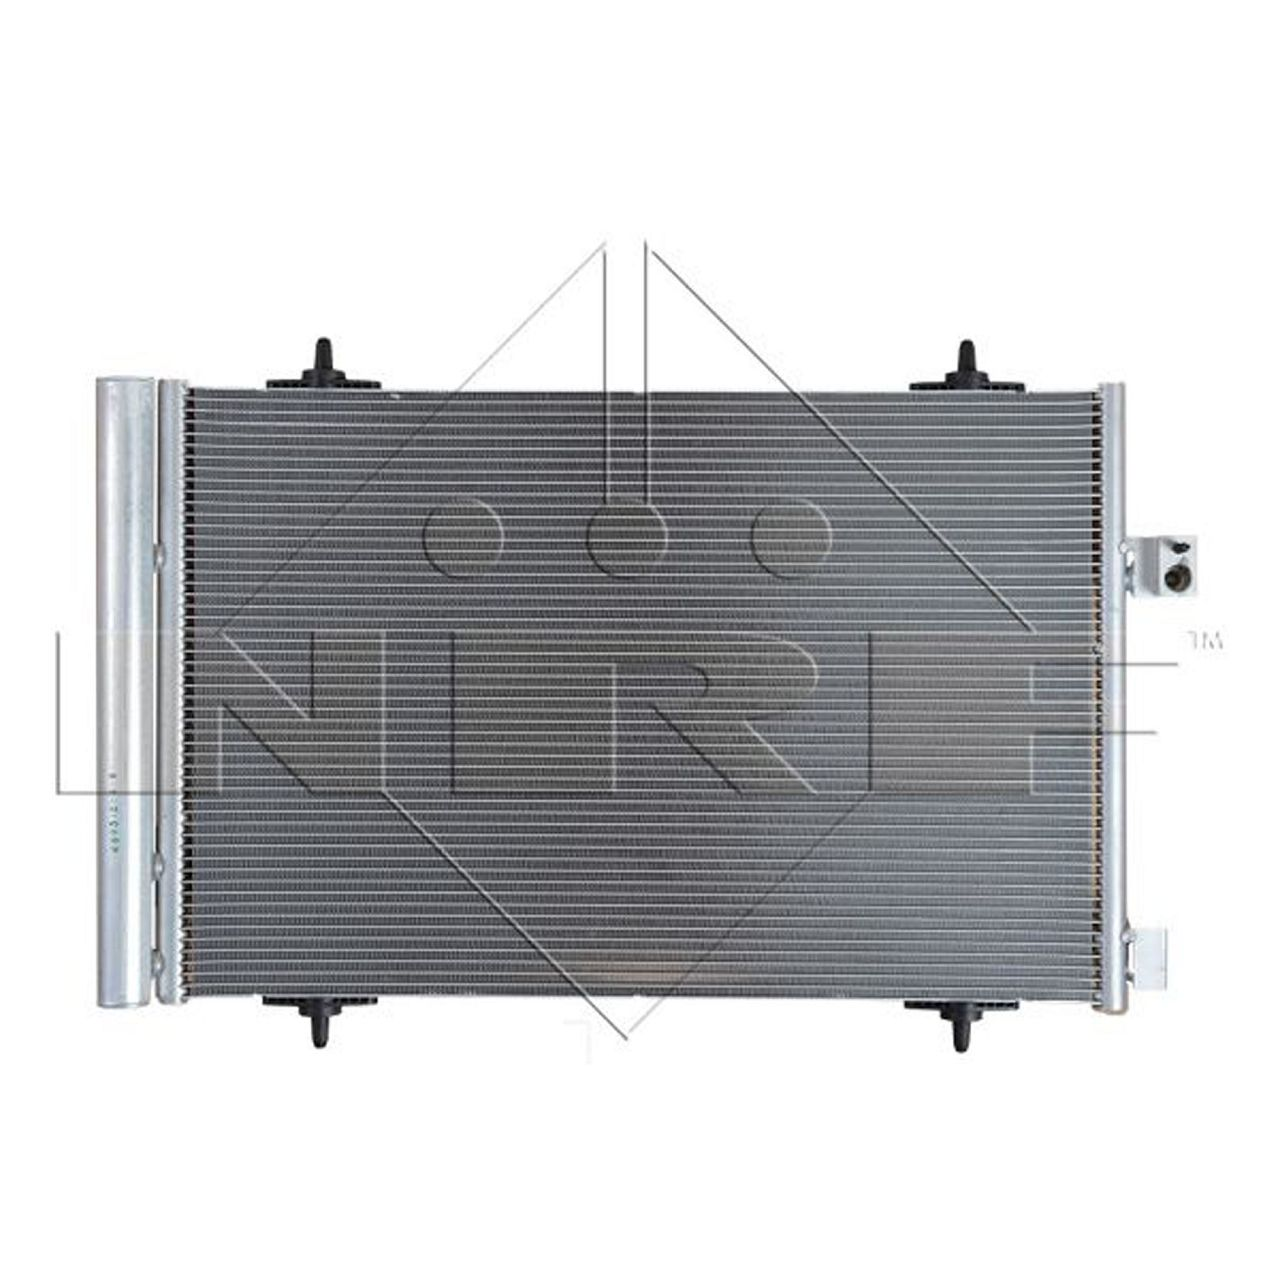 NRF 35946 EASY FIT Kondensator Klima PEUGEOT 407 508 1 2 CITROEN C5 3 RD RW 2.0 HDI 6455HV